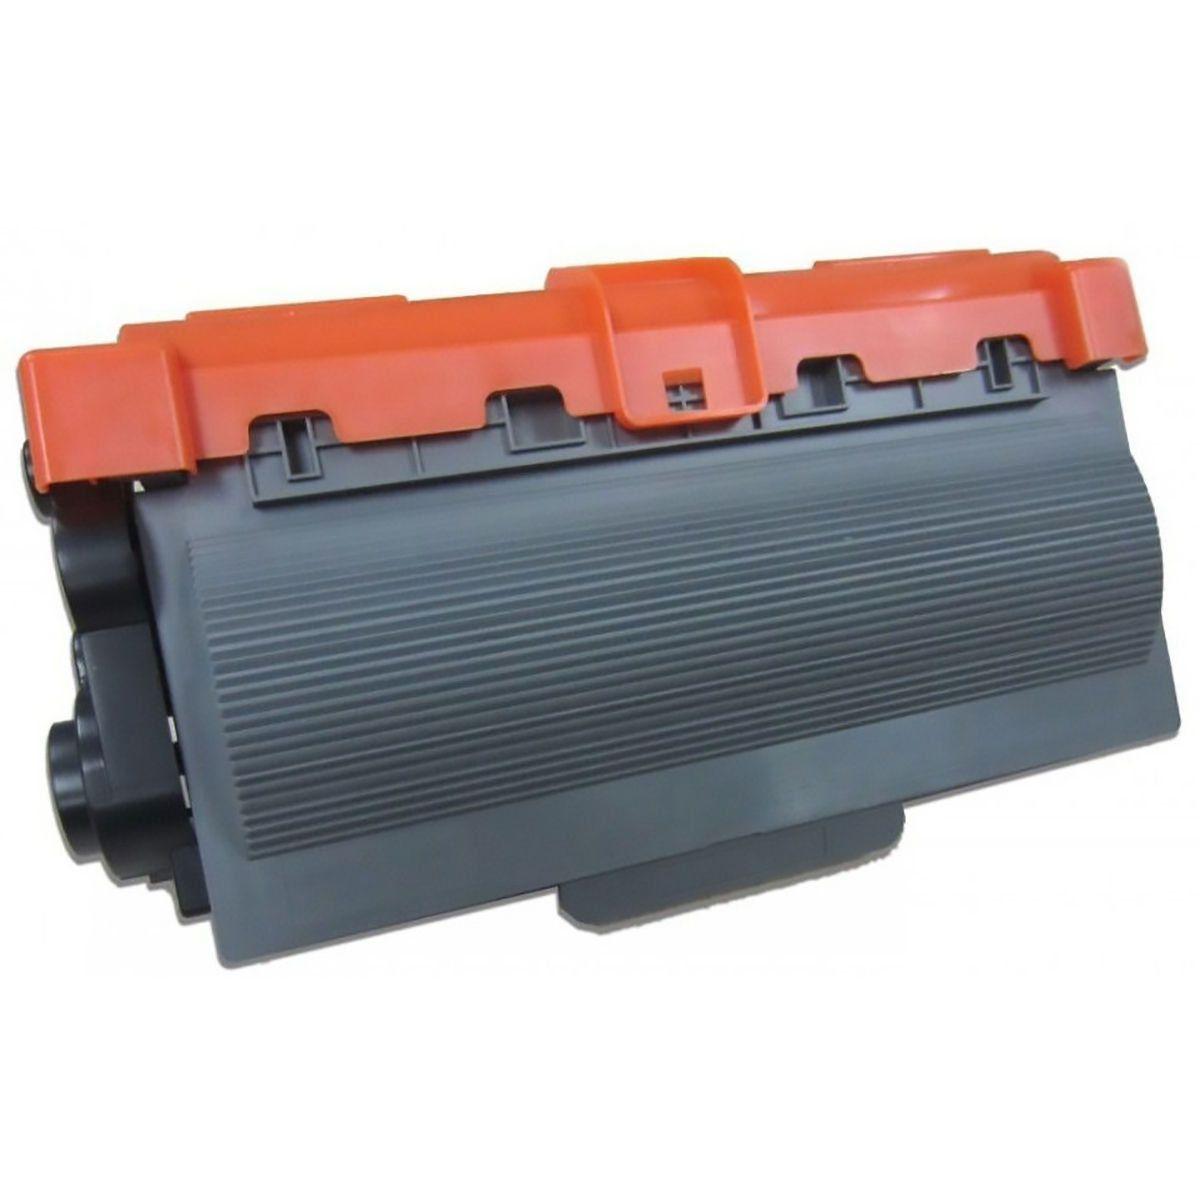 Compatível: Toner para impressora Brother DCP-8157dn DCP-8157 DCP8157dn DCP8157 / Preto / 12.000